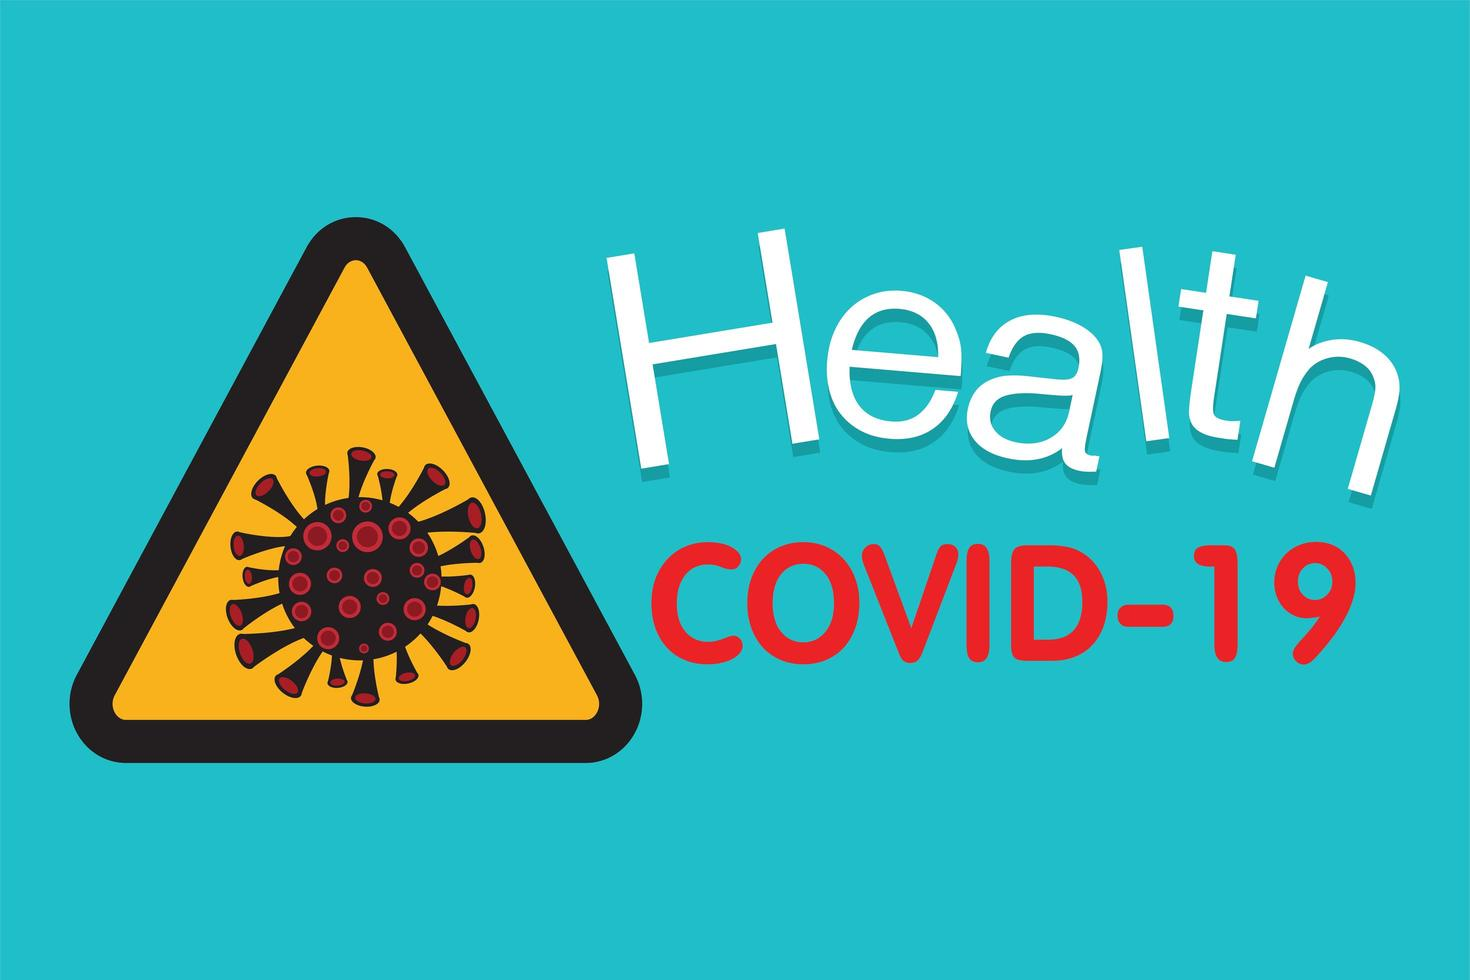 covid-19, Coronavirus-Ausbruchsvektordesign vektor